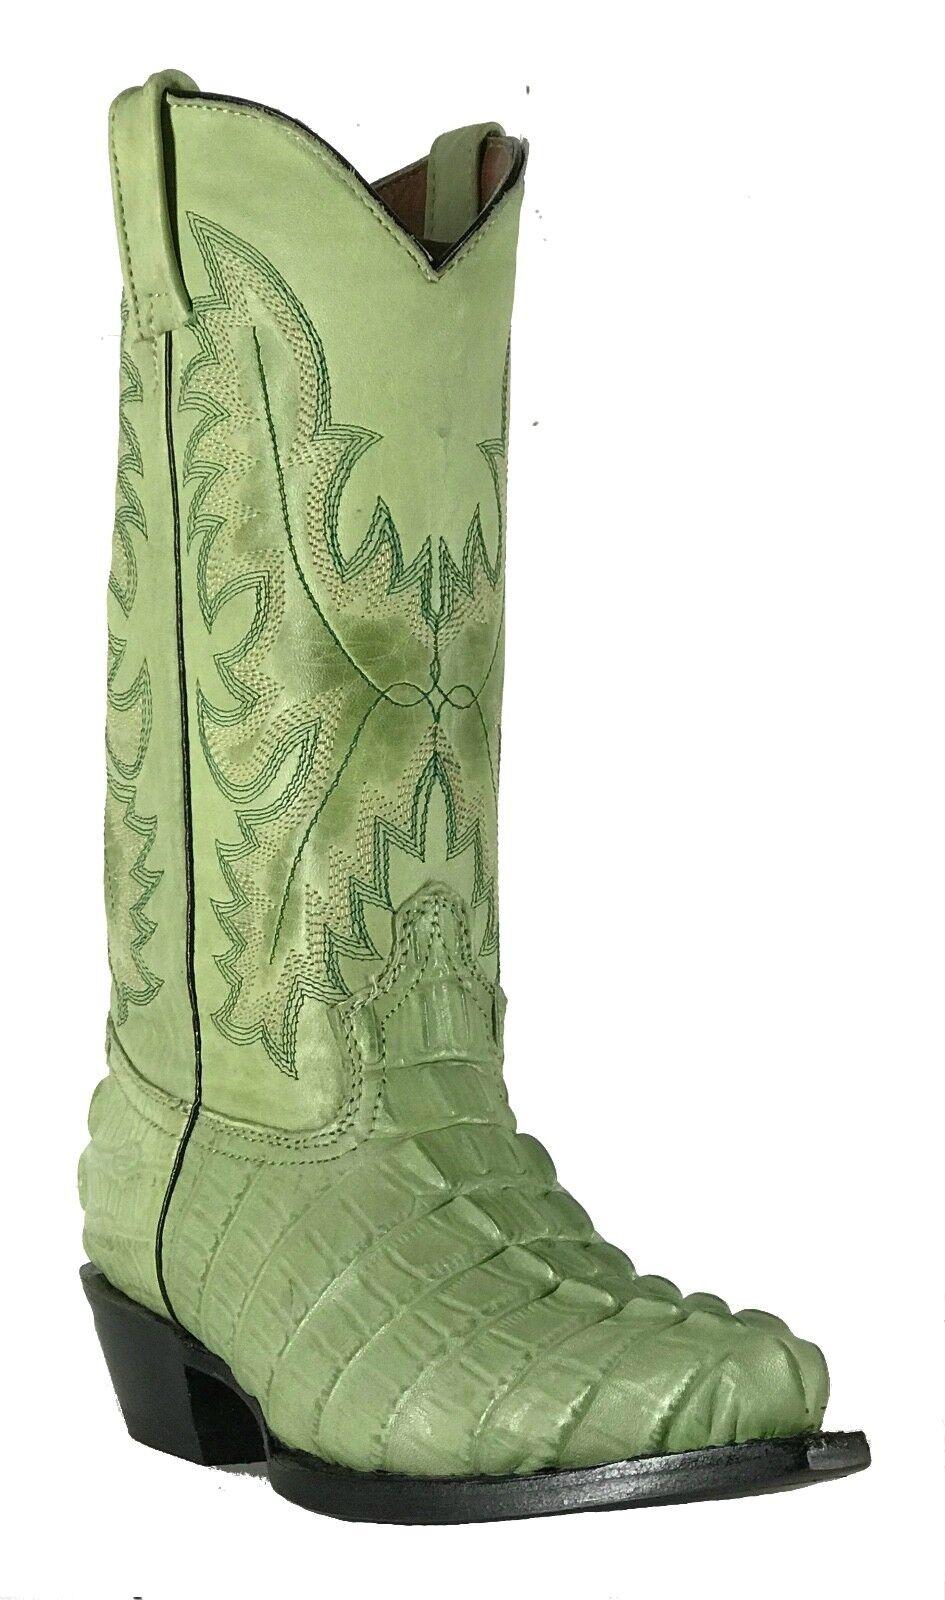 Wouomo New Leather Crocodile Design Western Cowgirl Biker stivali Snip verde